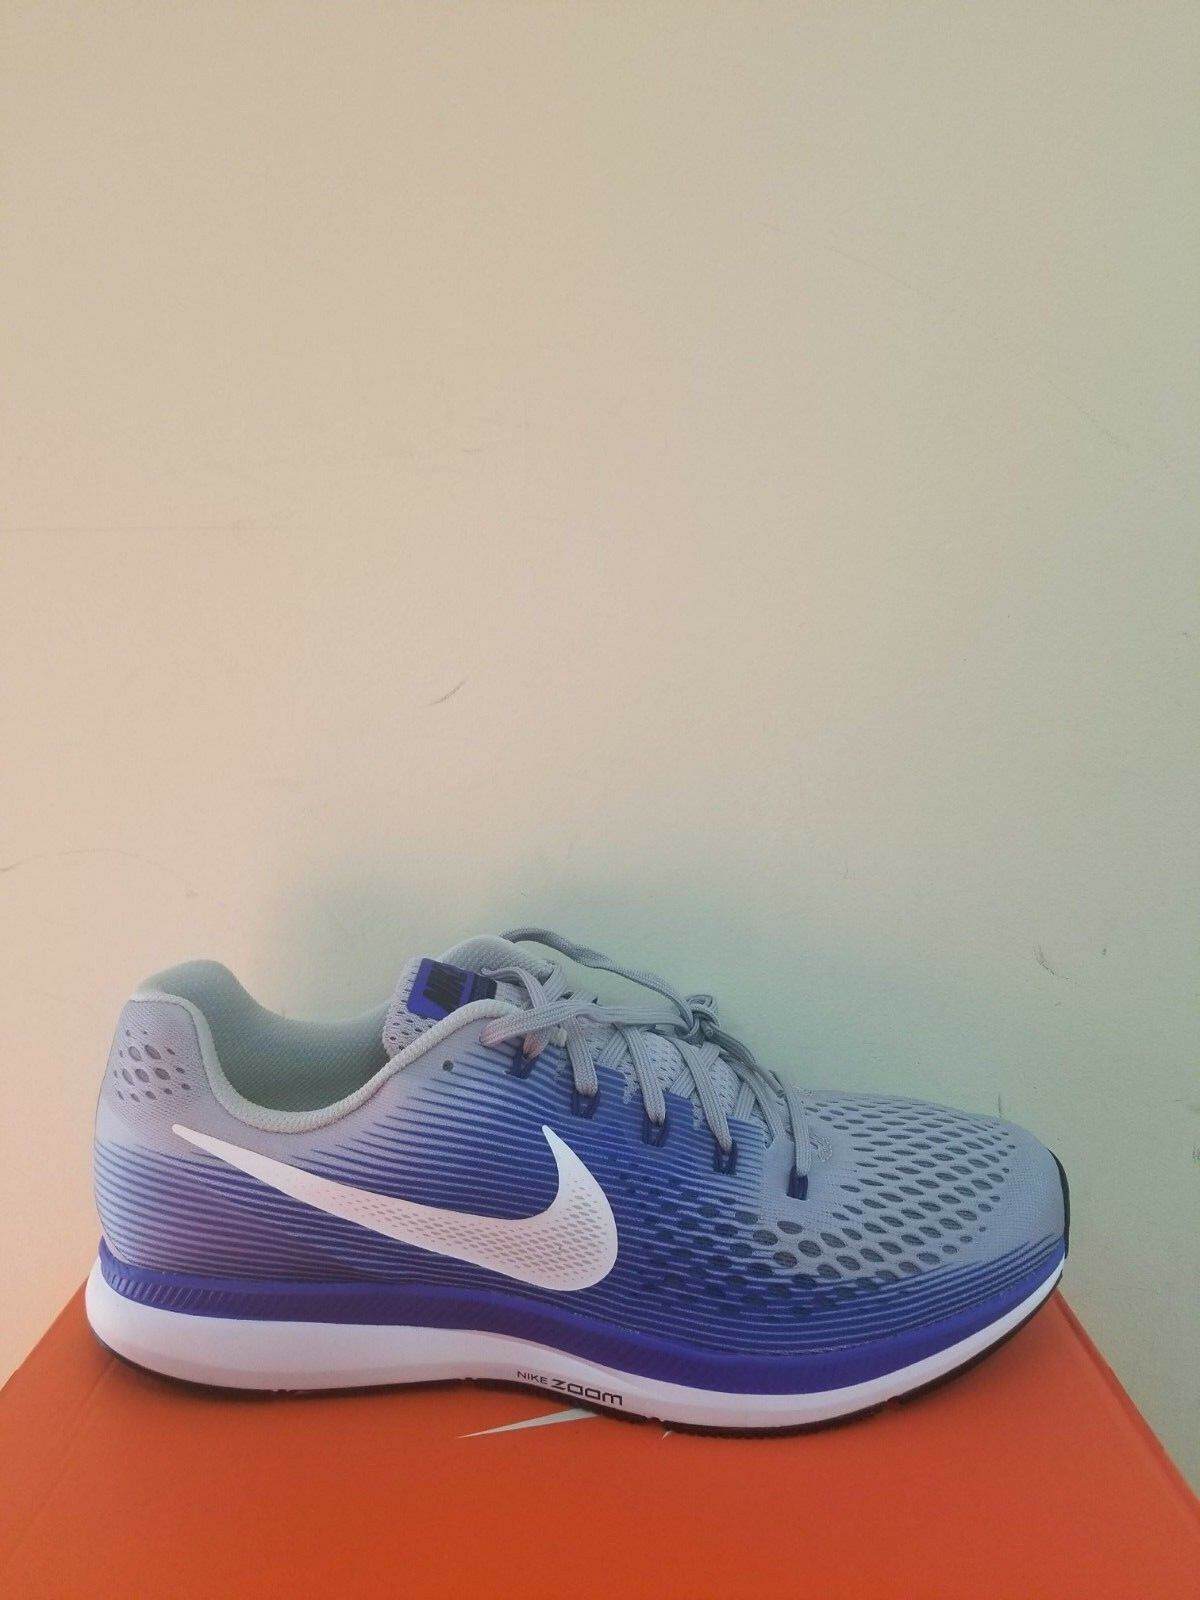 New New New Nike Men's Air Zoom Pegasus 34  Running shoes Size 11.5 NIB cd100f